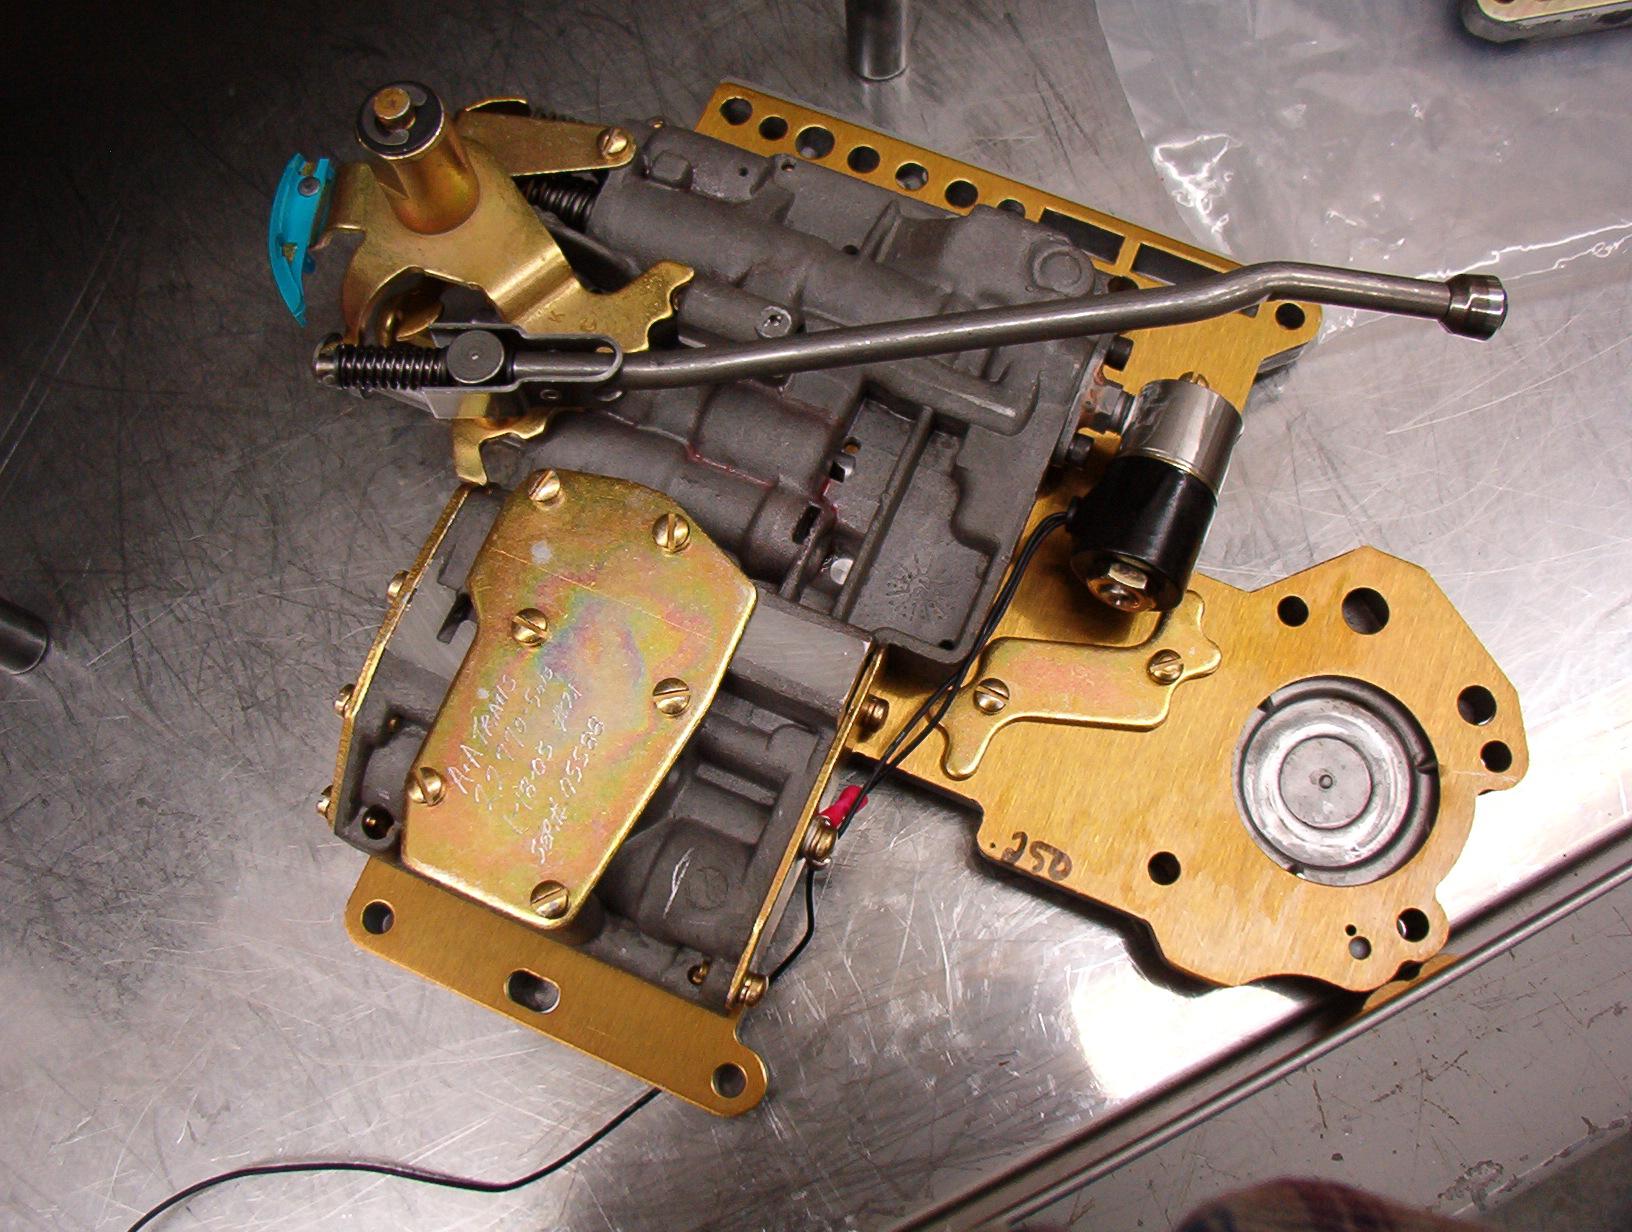 transbrake reverse wiring unlawfl 39 s race engine tech moparts forums. Black Bedroom Furniture Sets. Home Design Ideas